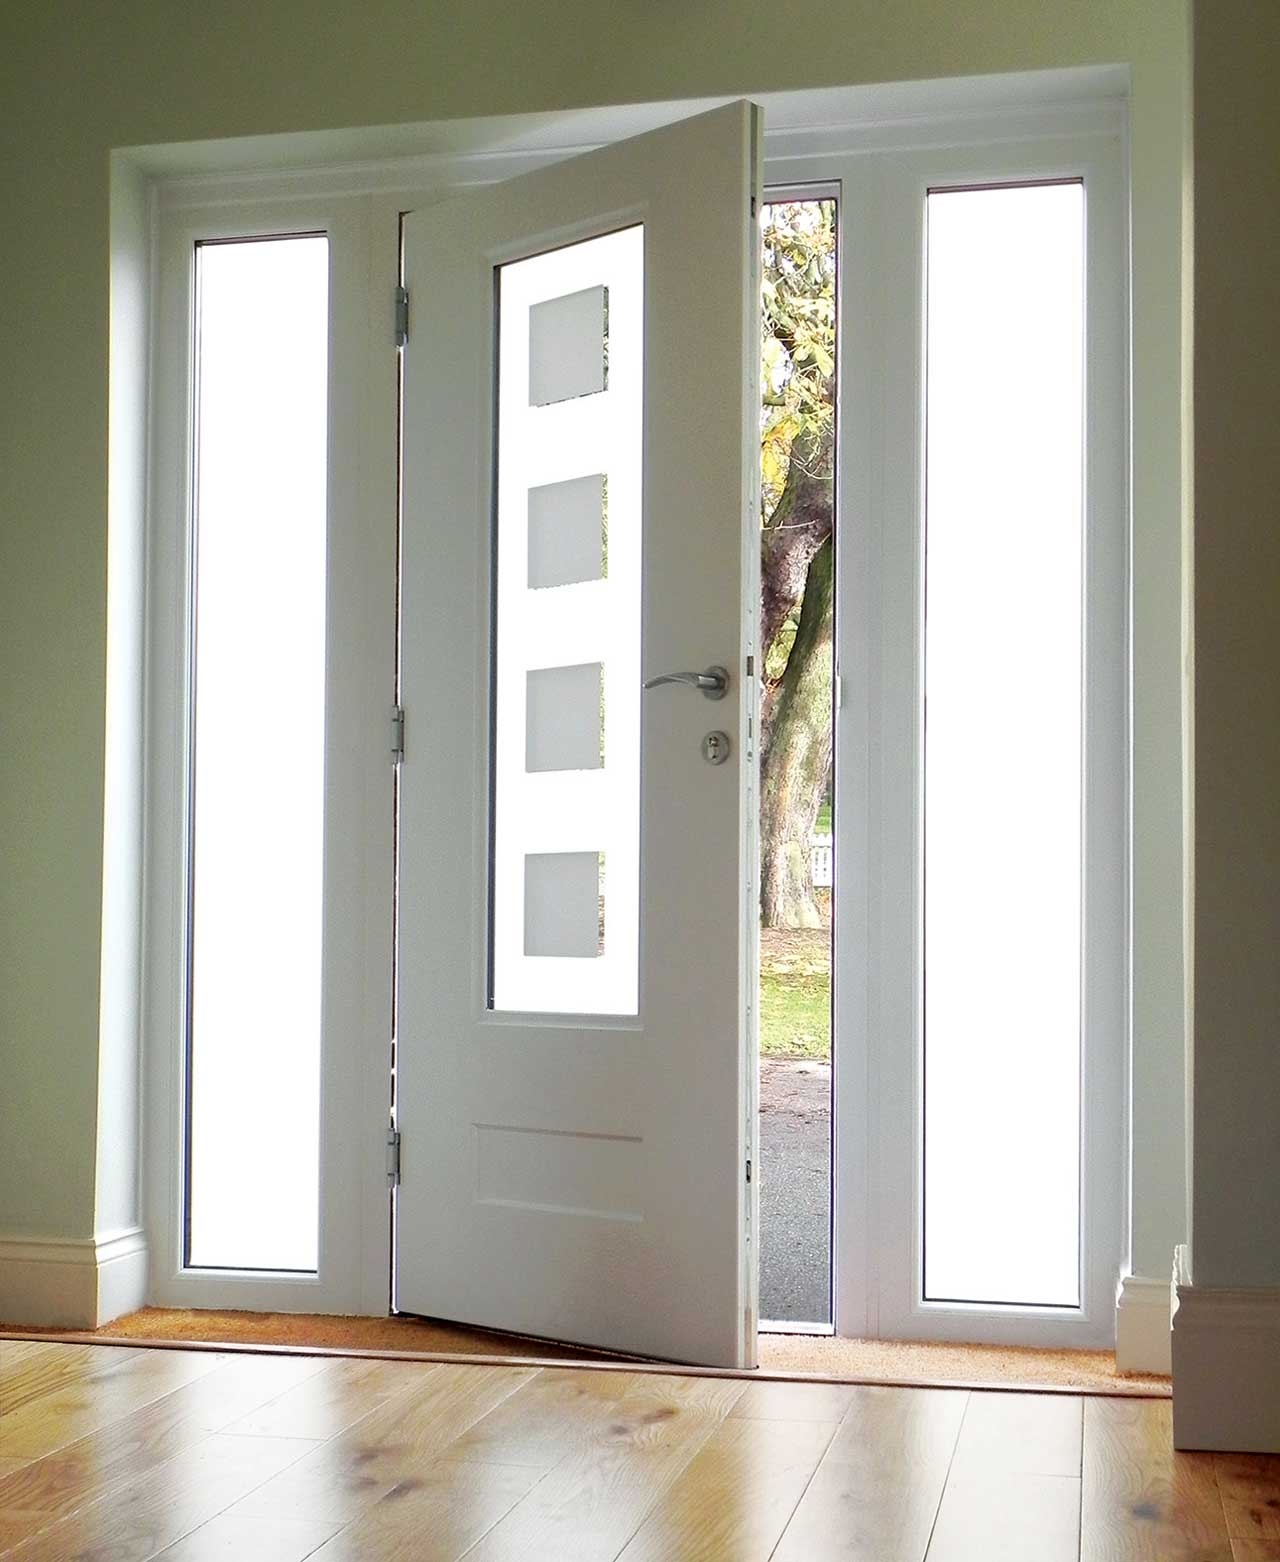 composite front doors royal leamington spa